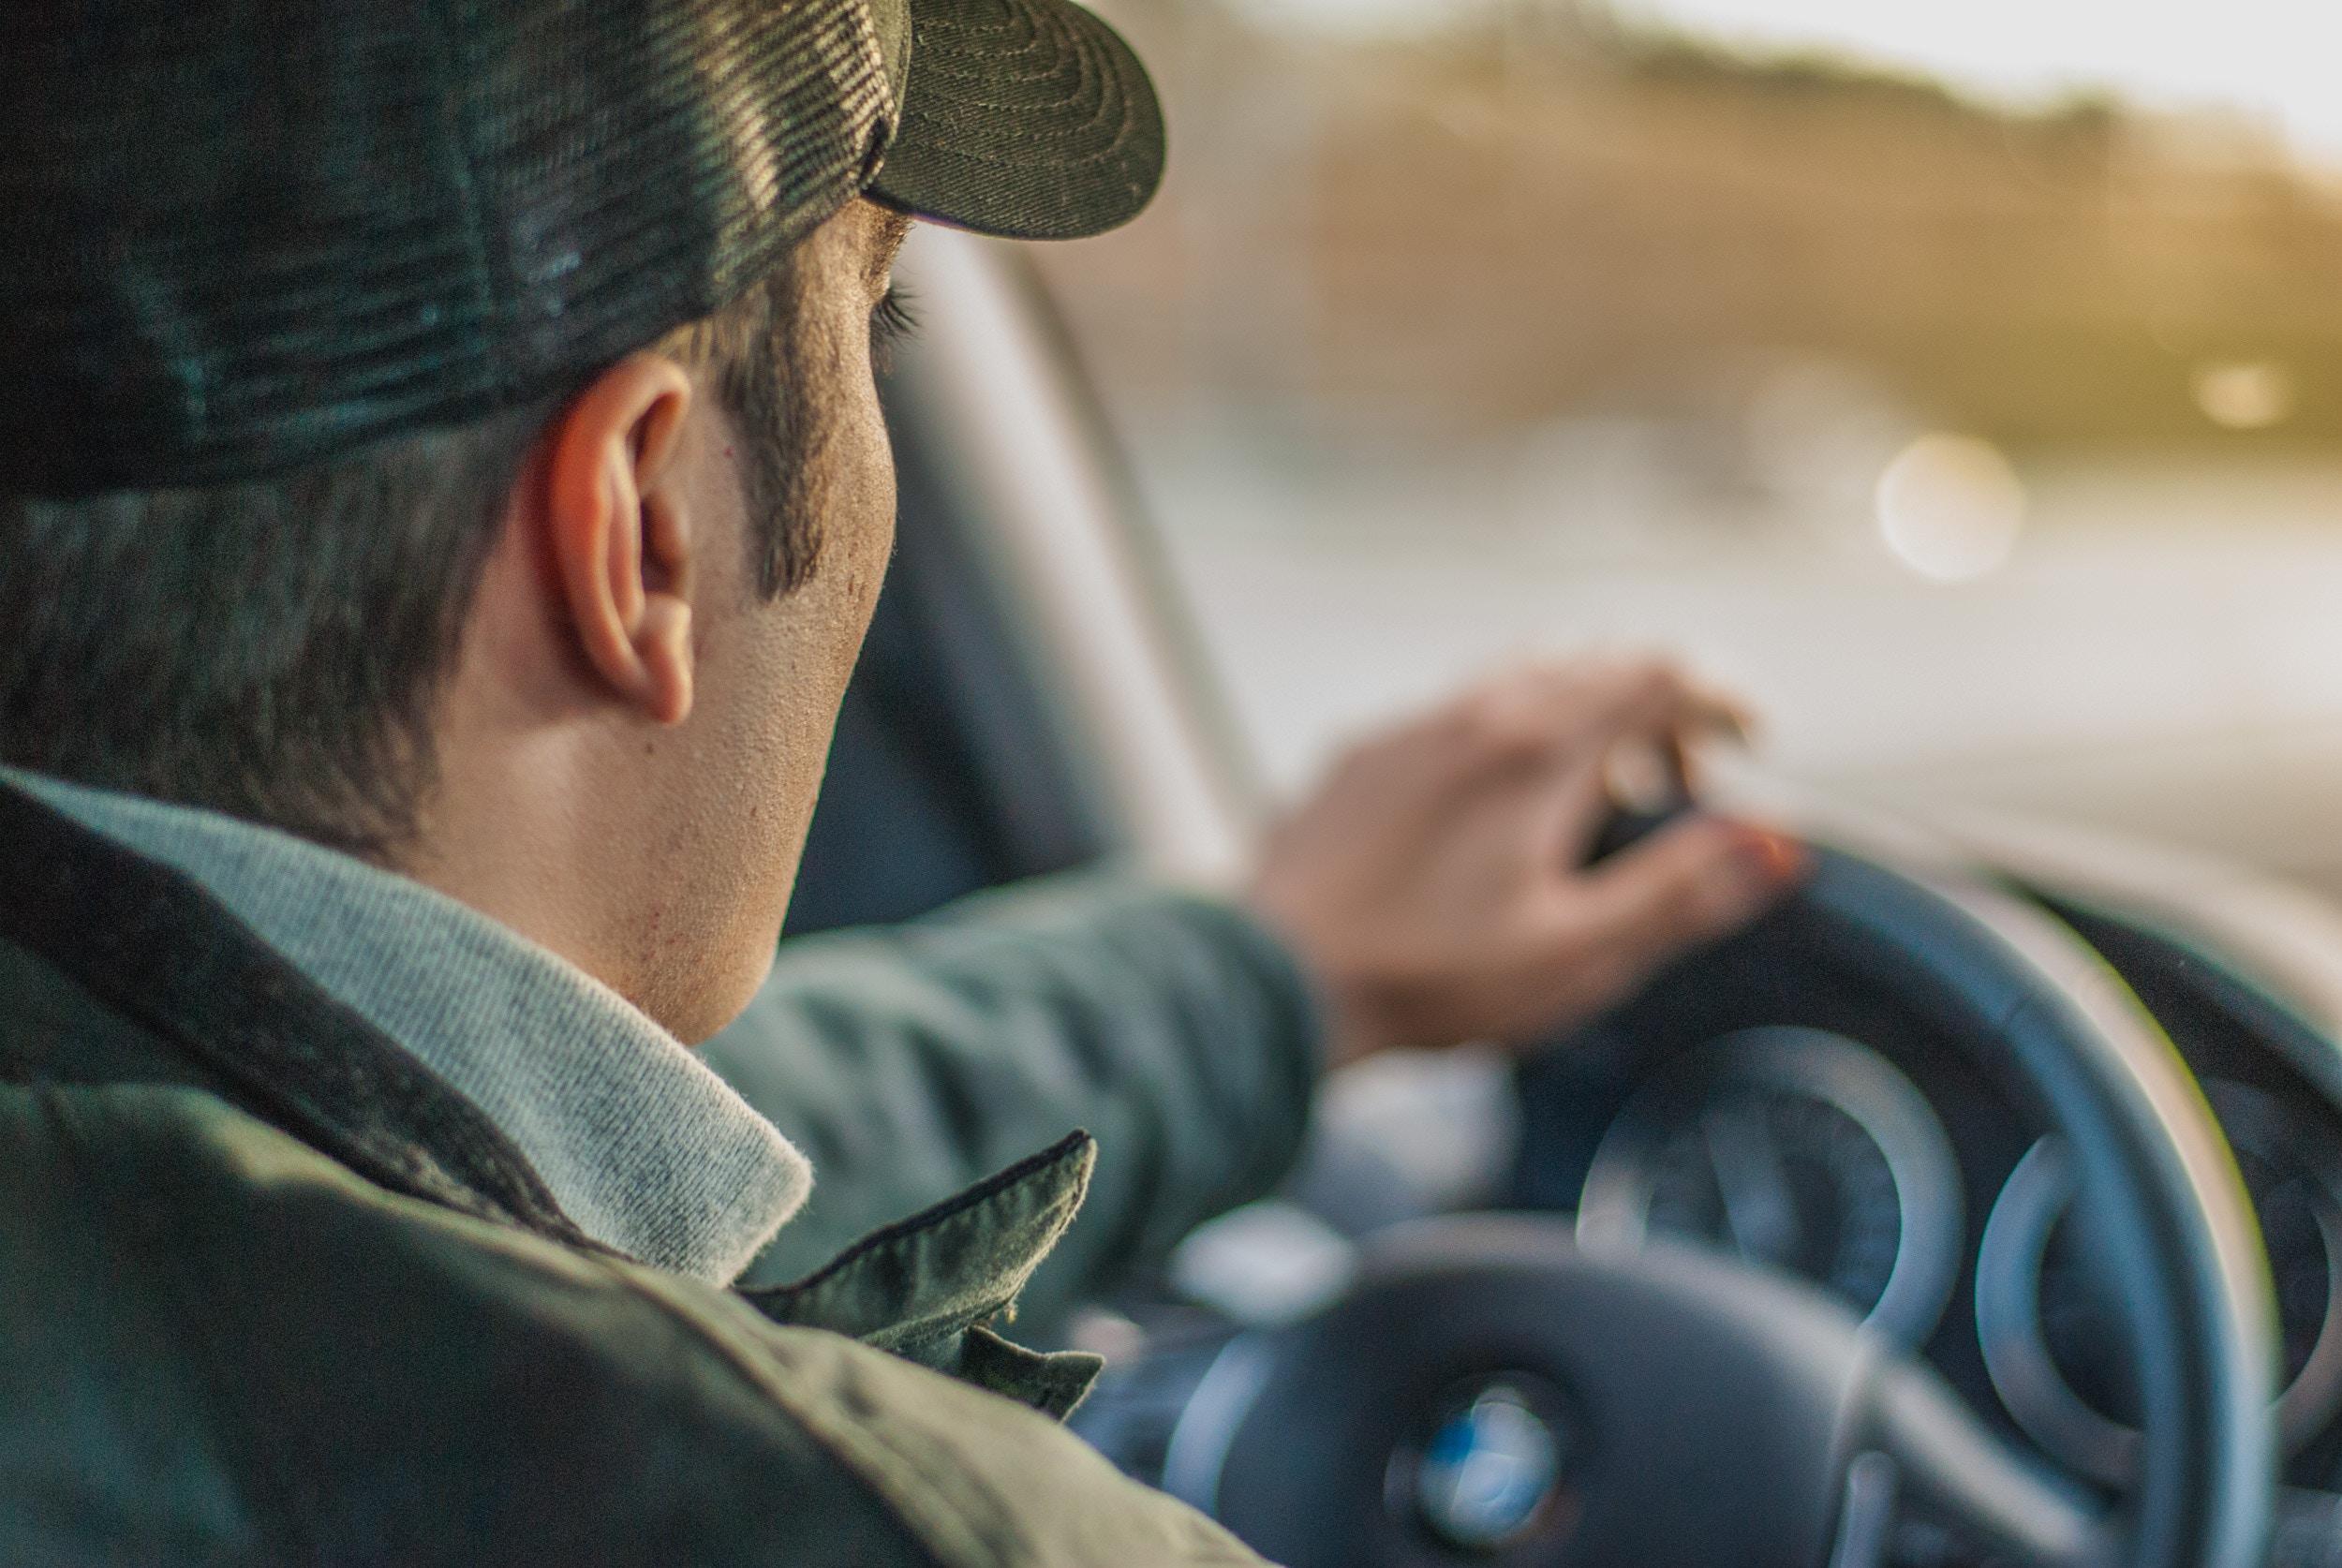 salaire-chauffeur-livreur-interim